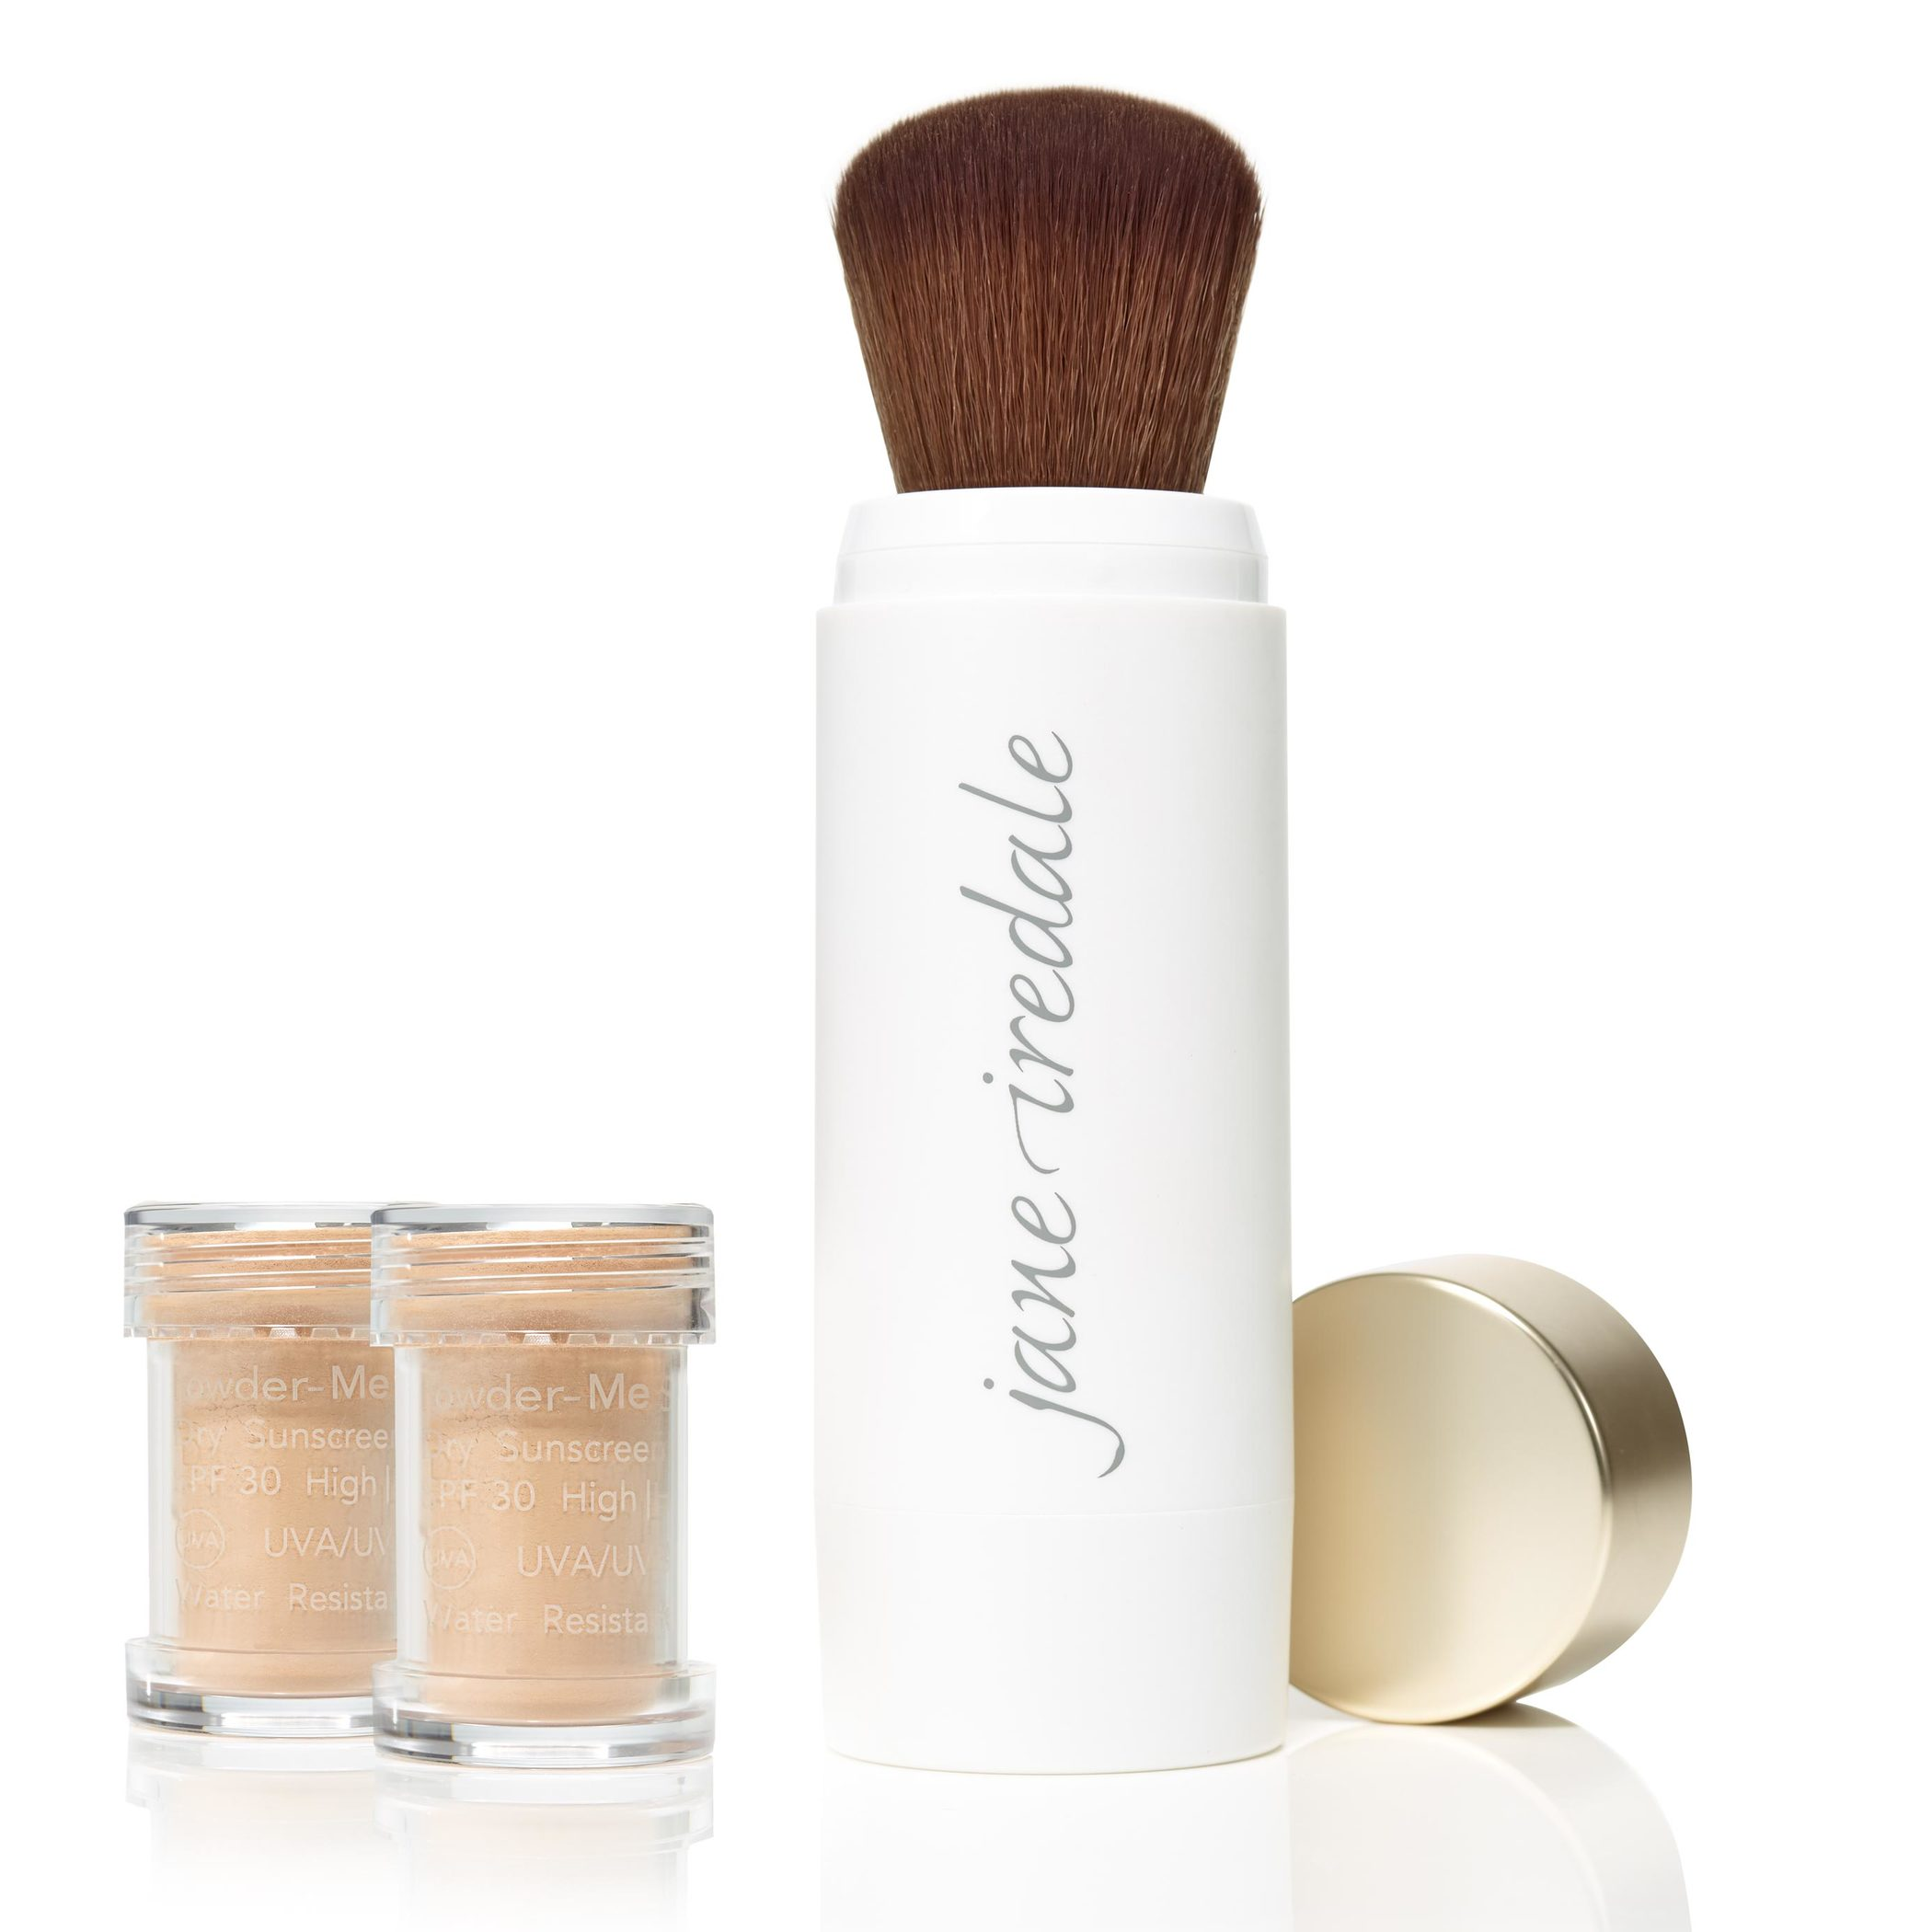 Jane Iredale Powder Me Refillable Brush, nude